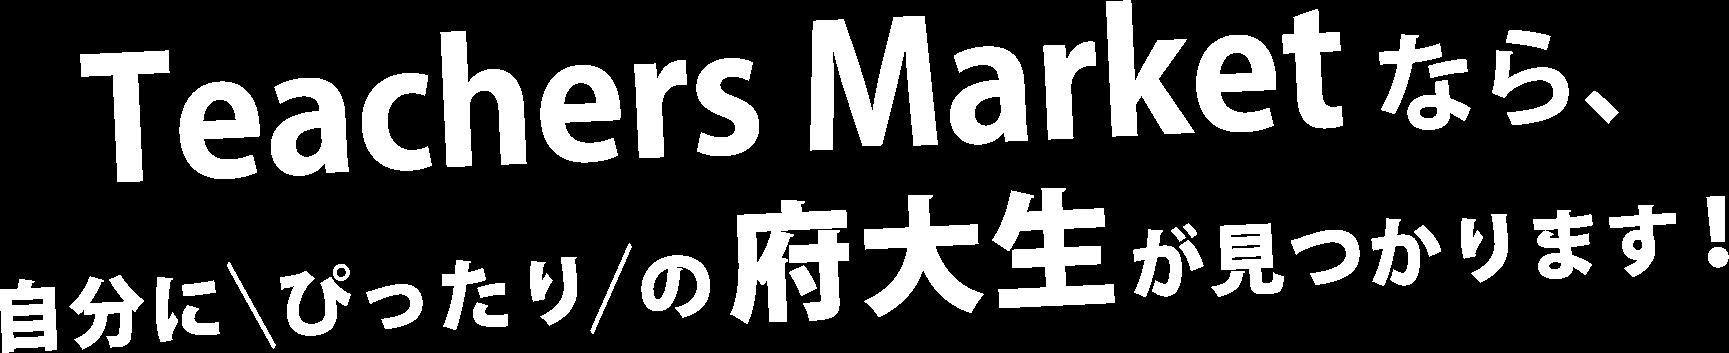 Teachers Marketなら、自分にぴったりの大阪府立大学生が見つかります!